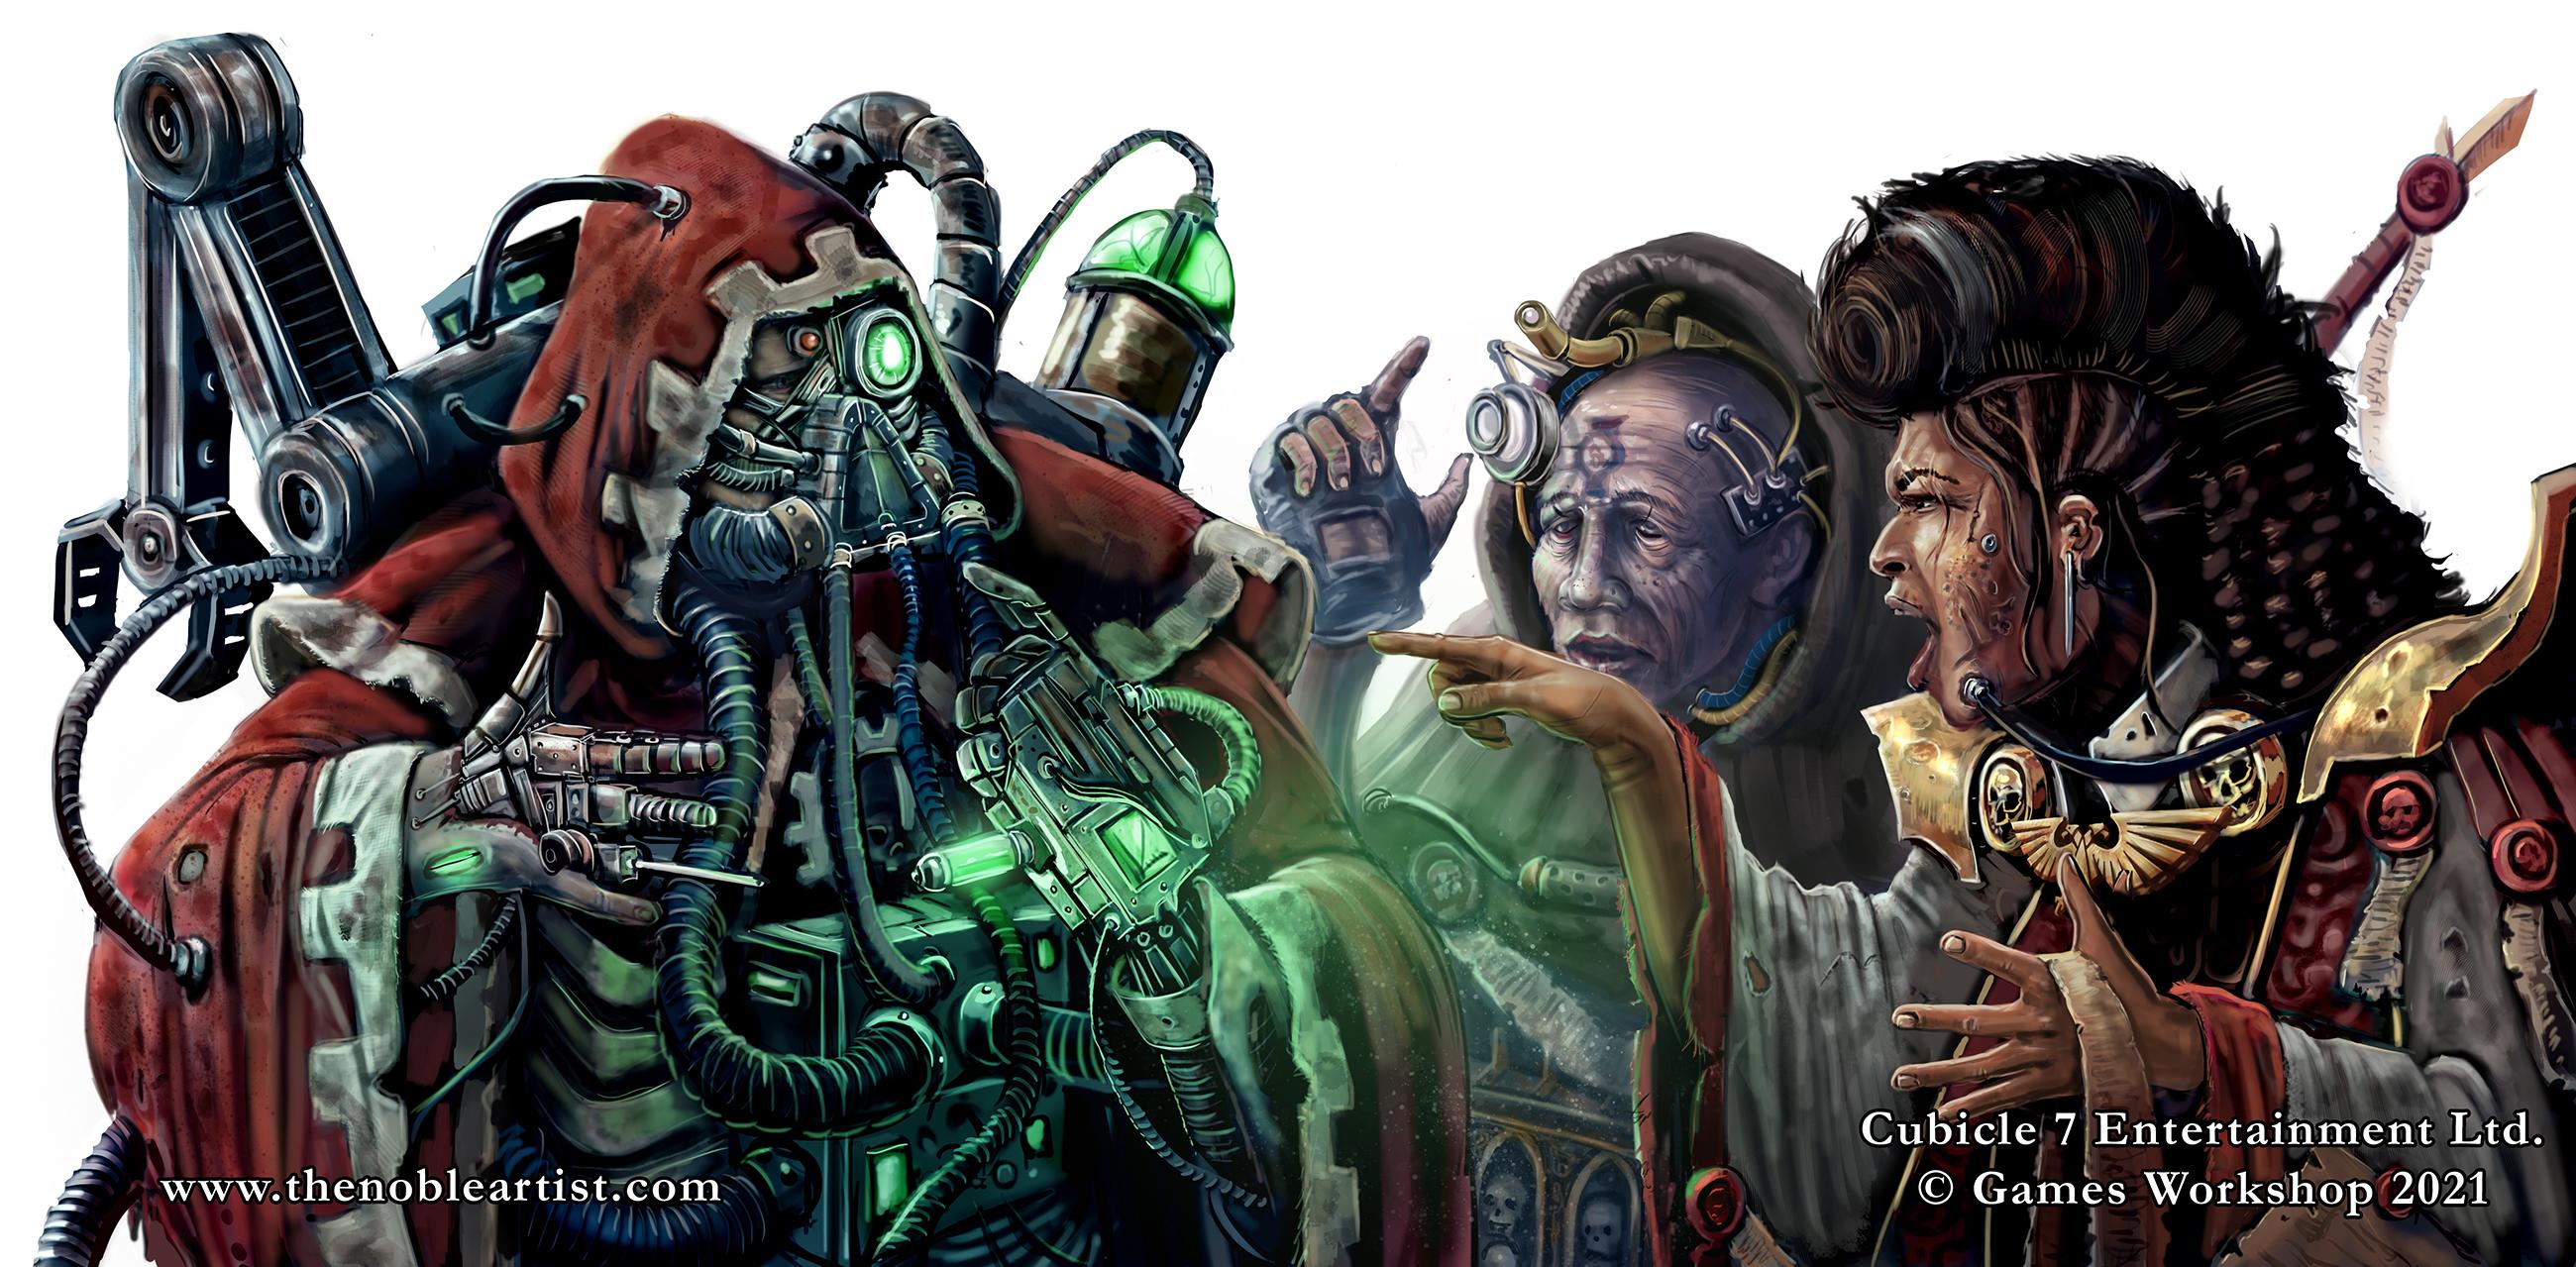 Warhammer 40k art of Adeptus Mechanicus tech priest, Ministorum Priest, Administratum Adept. Official artwork for Cubicle 7 by The Noble Artist